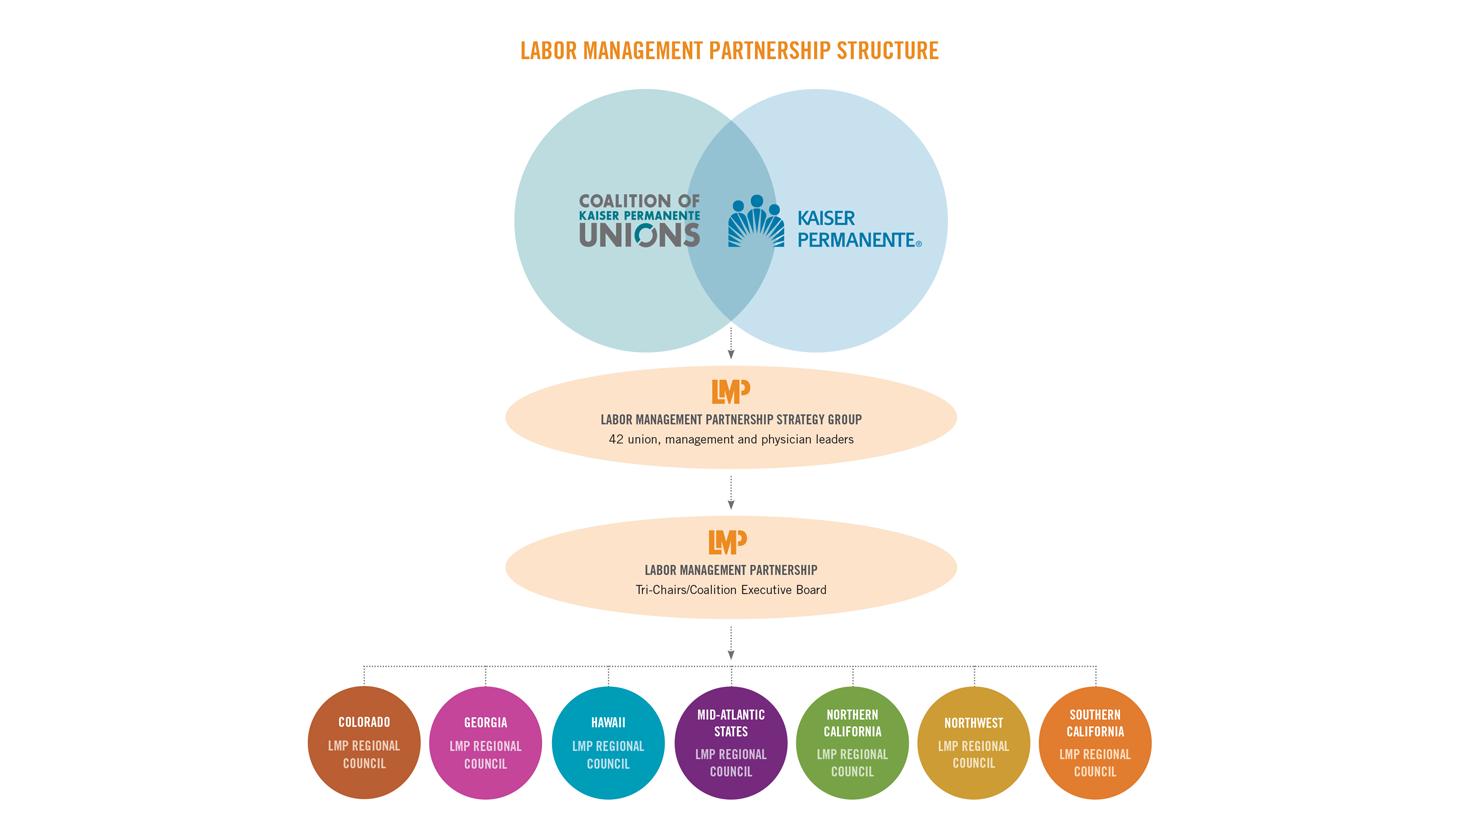 The Labor Management Partnership Organizational Structure